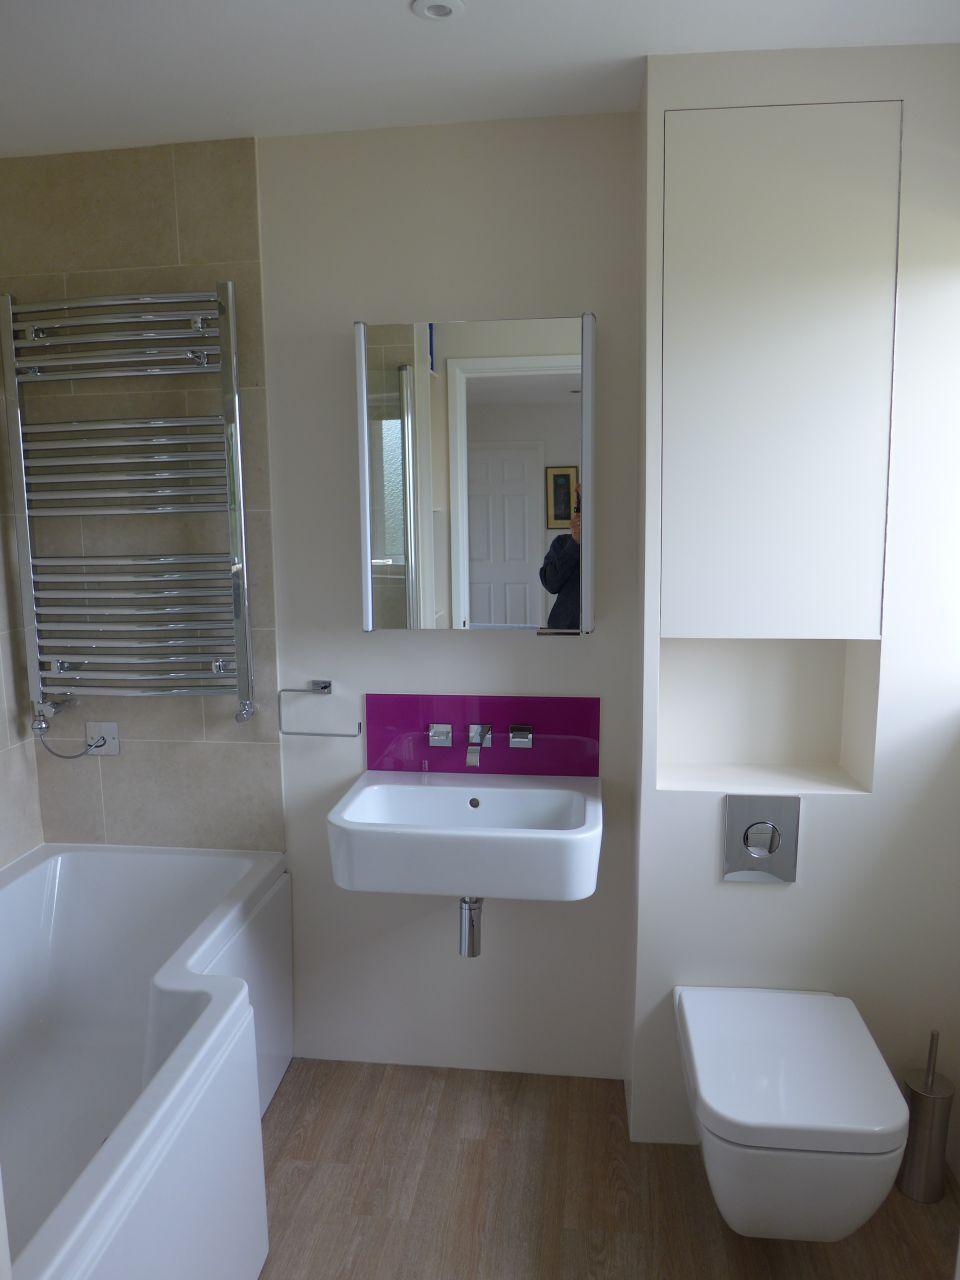 Bathroom Design 2m X 3m Bathroomdesign2mx3m Bathroom Design Bathroom Cabinets Designs Bathroom Inspiration Modern